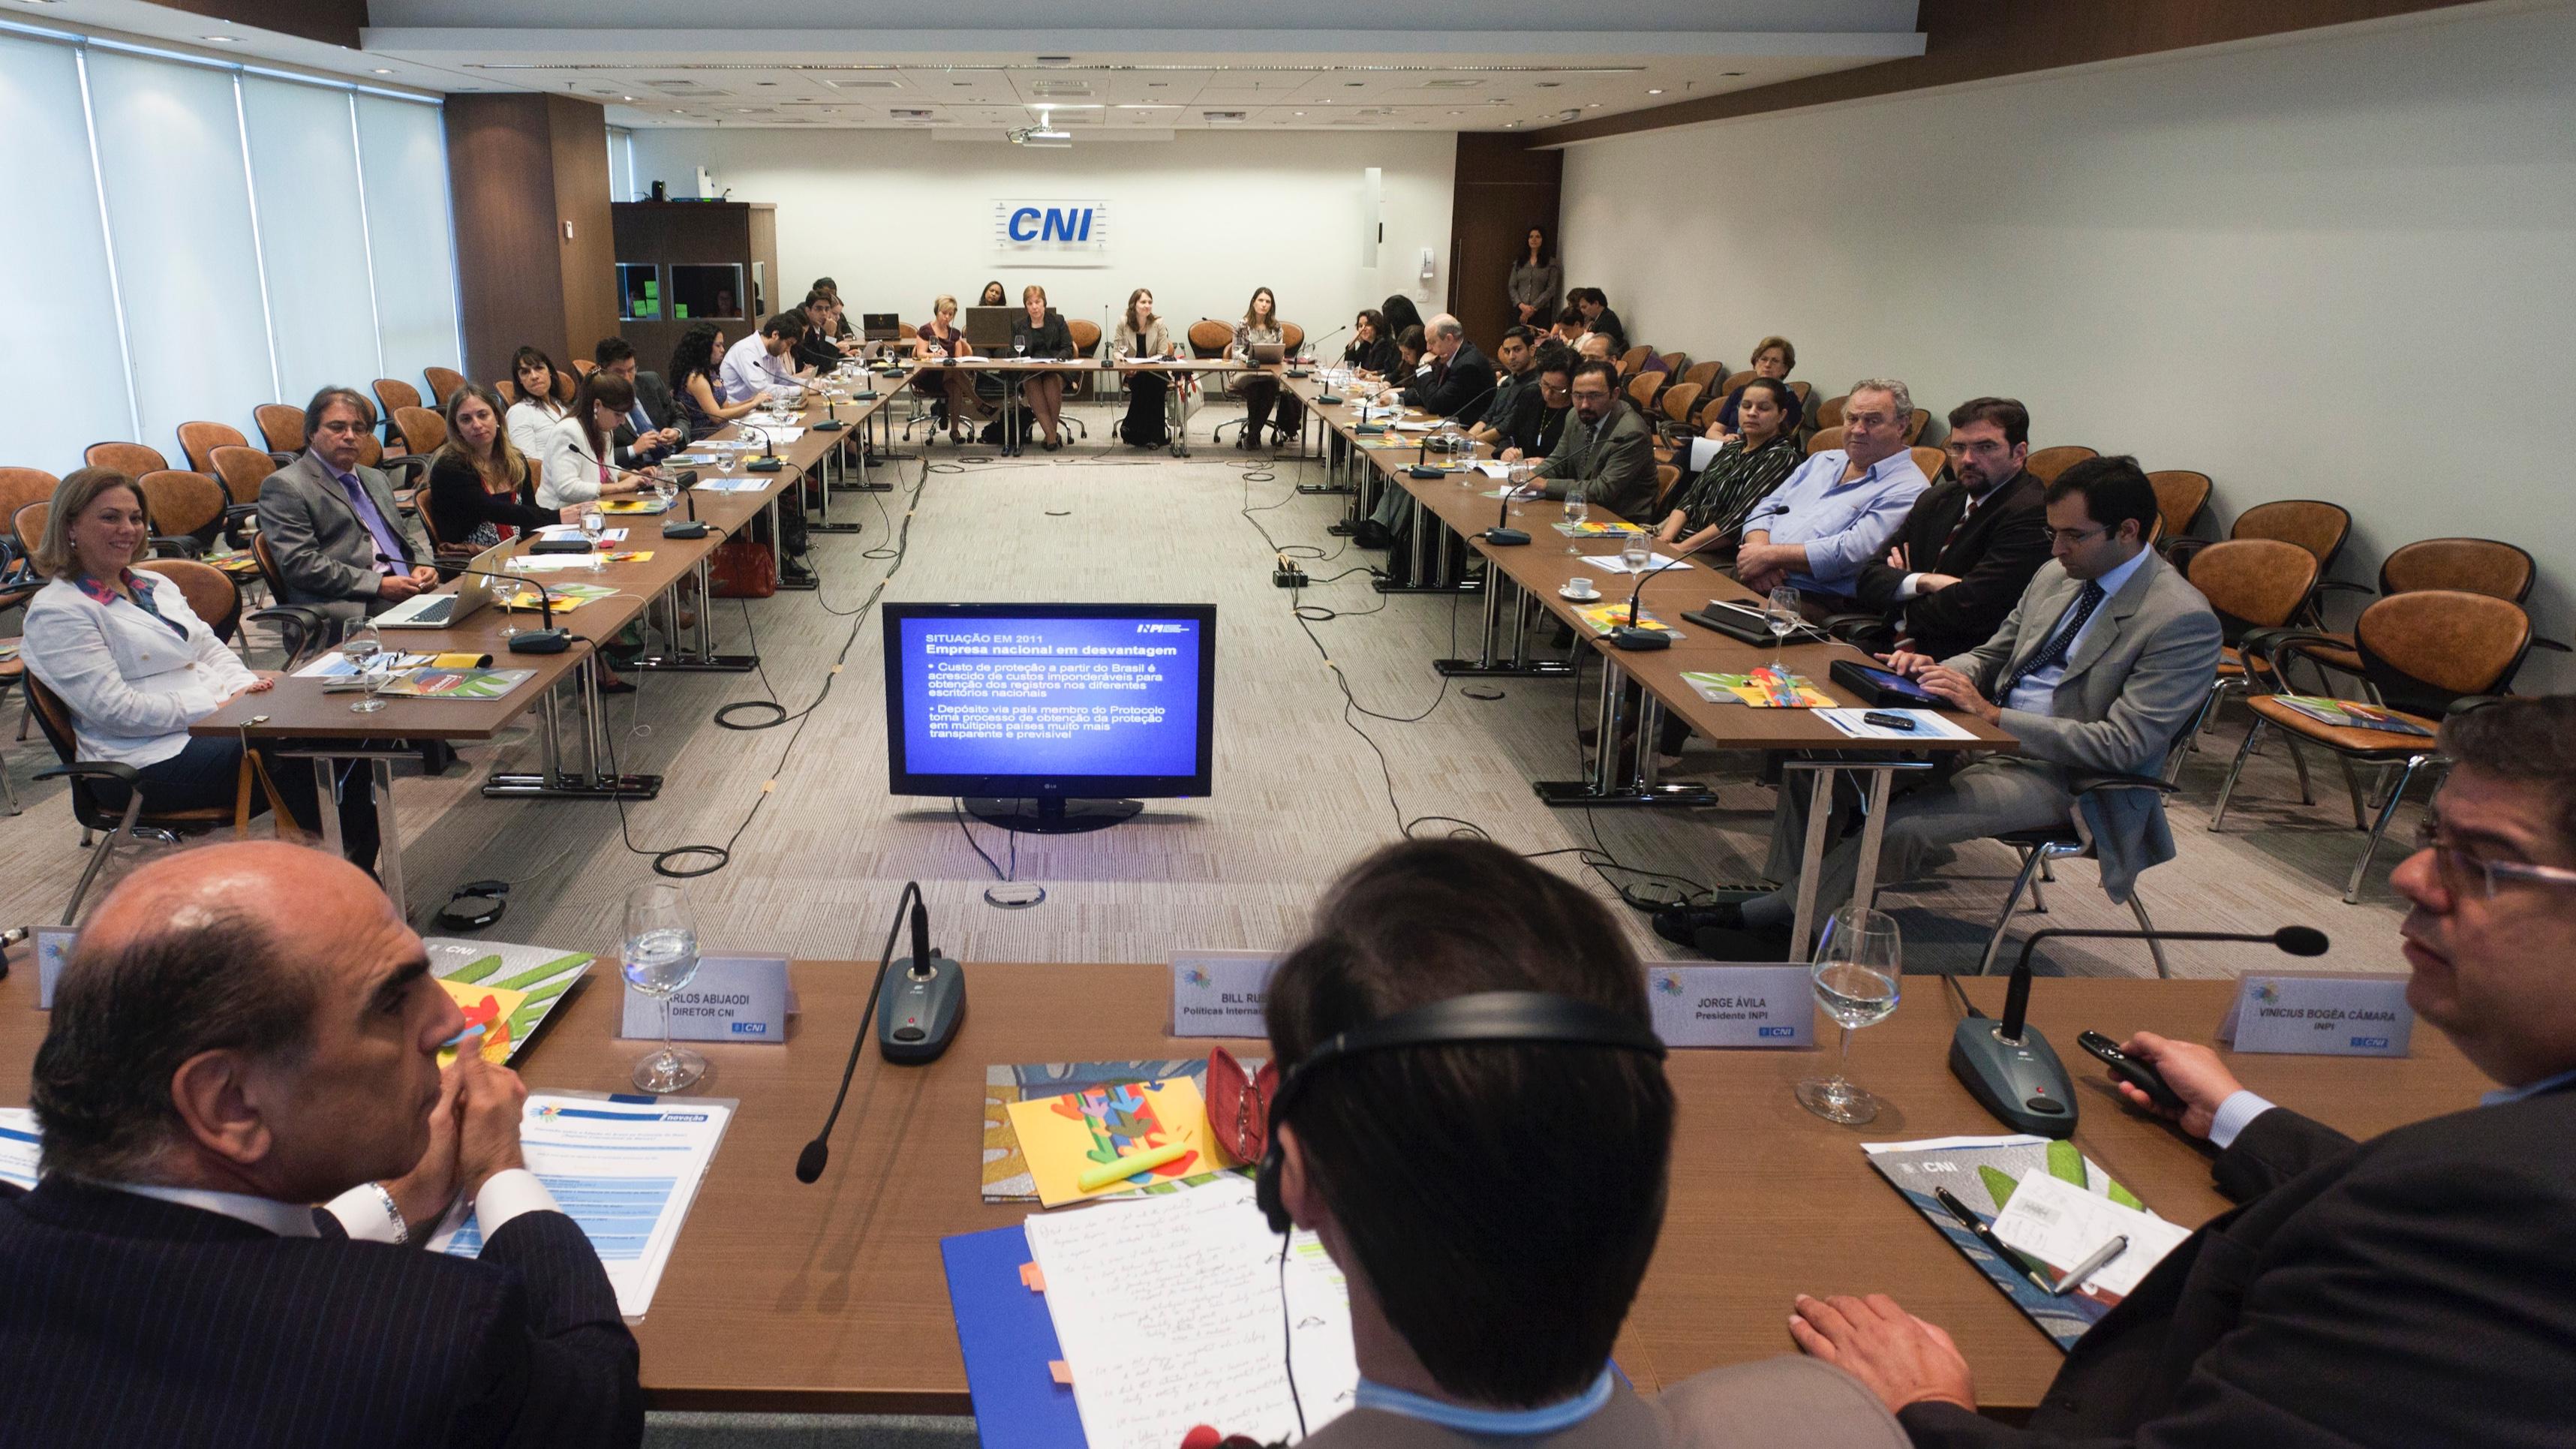 INPI promove consultas públicas sobre Protocolo de Madri e outros temas da Propriedade Intelectual